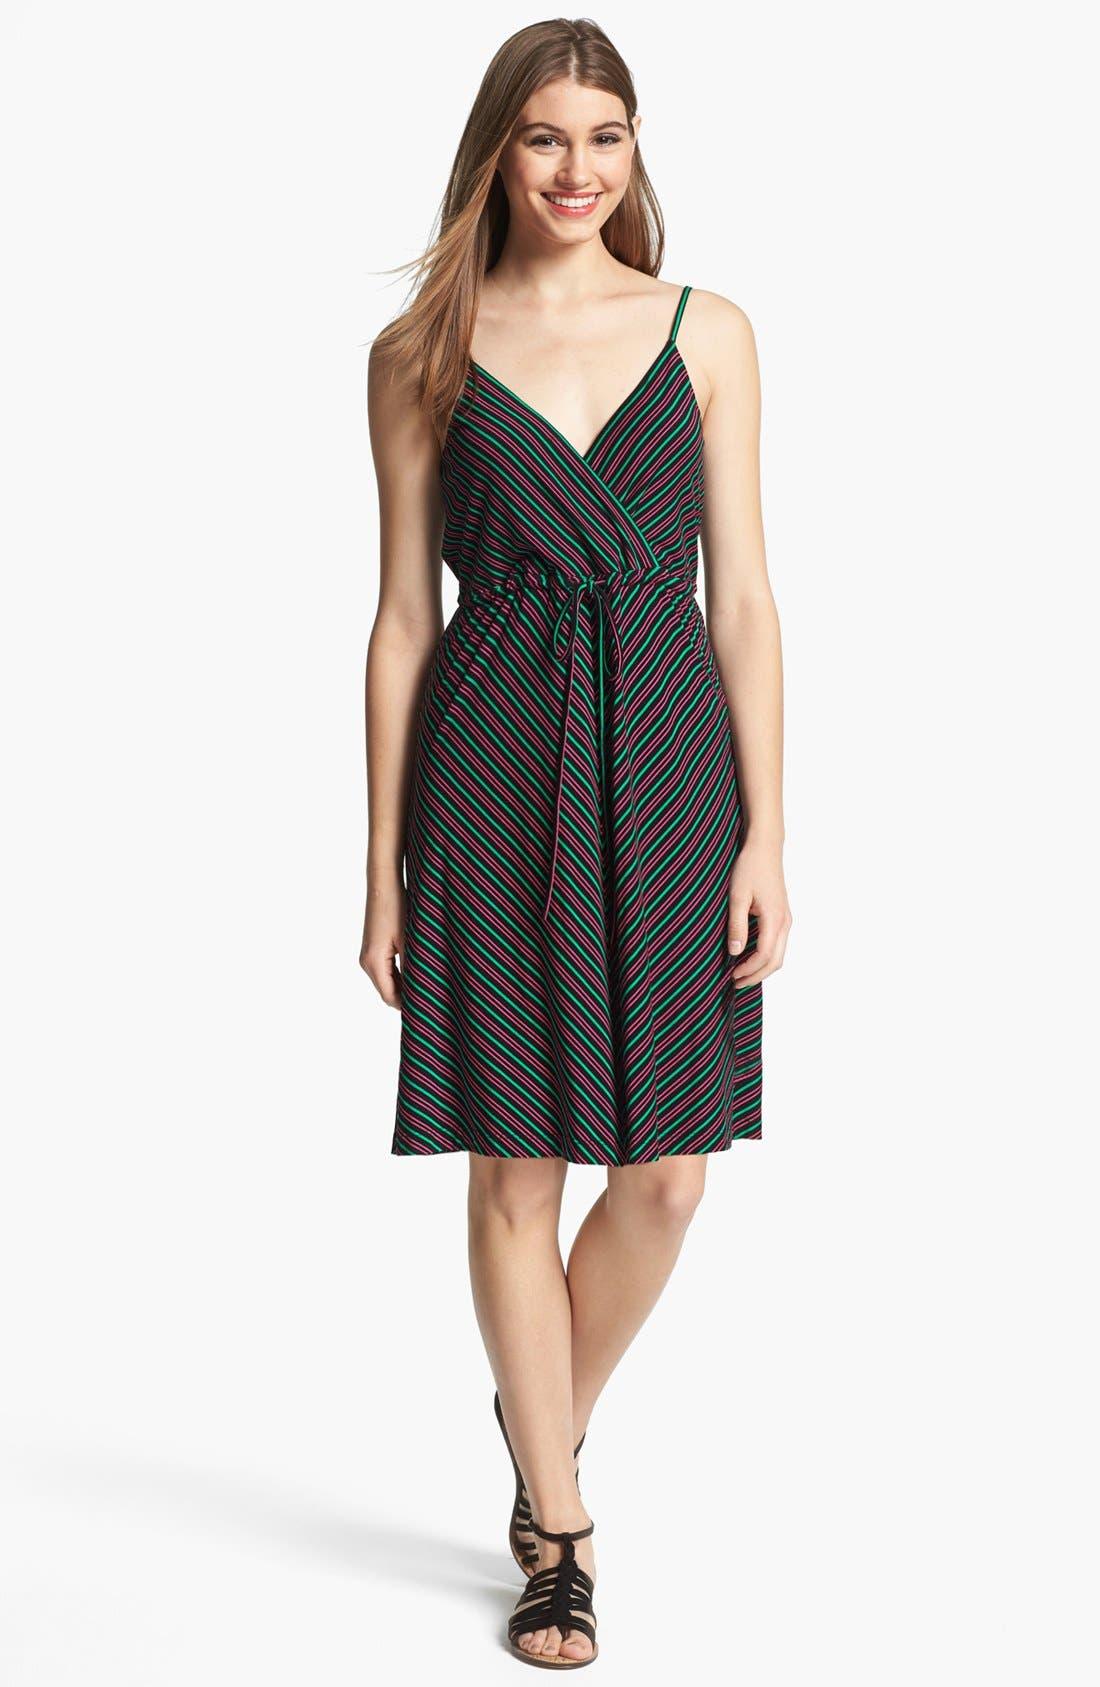 Alternate Image 1 Selected - Calvin Klein Stripe Knit Fit & Flare Dress